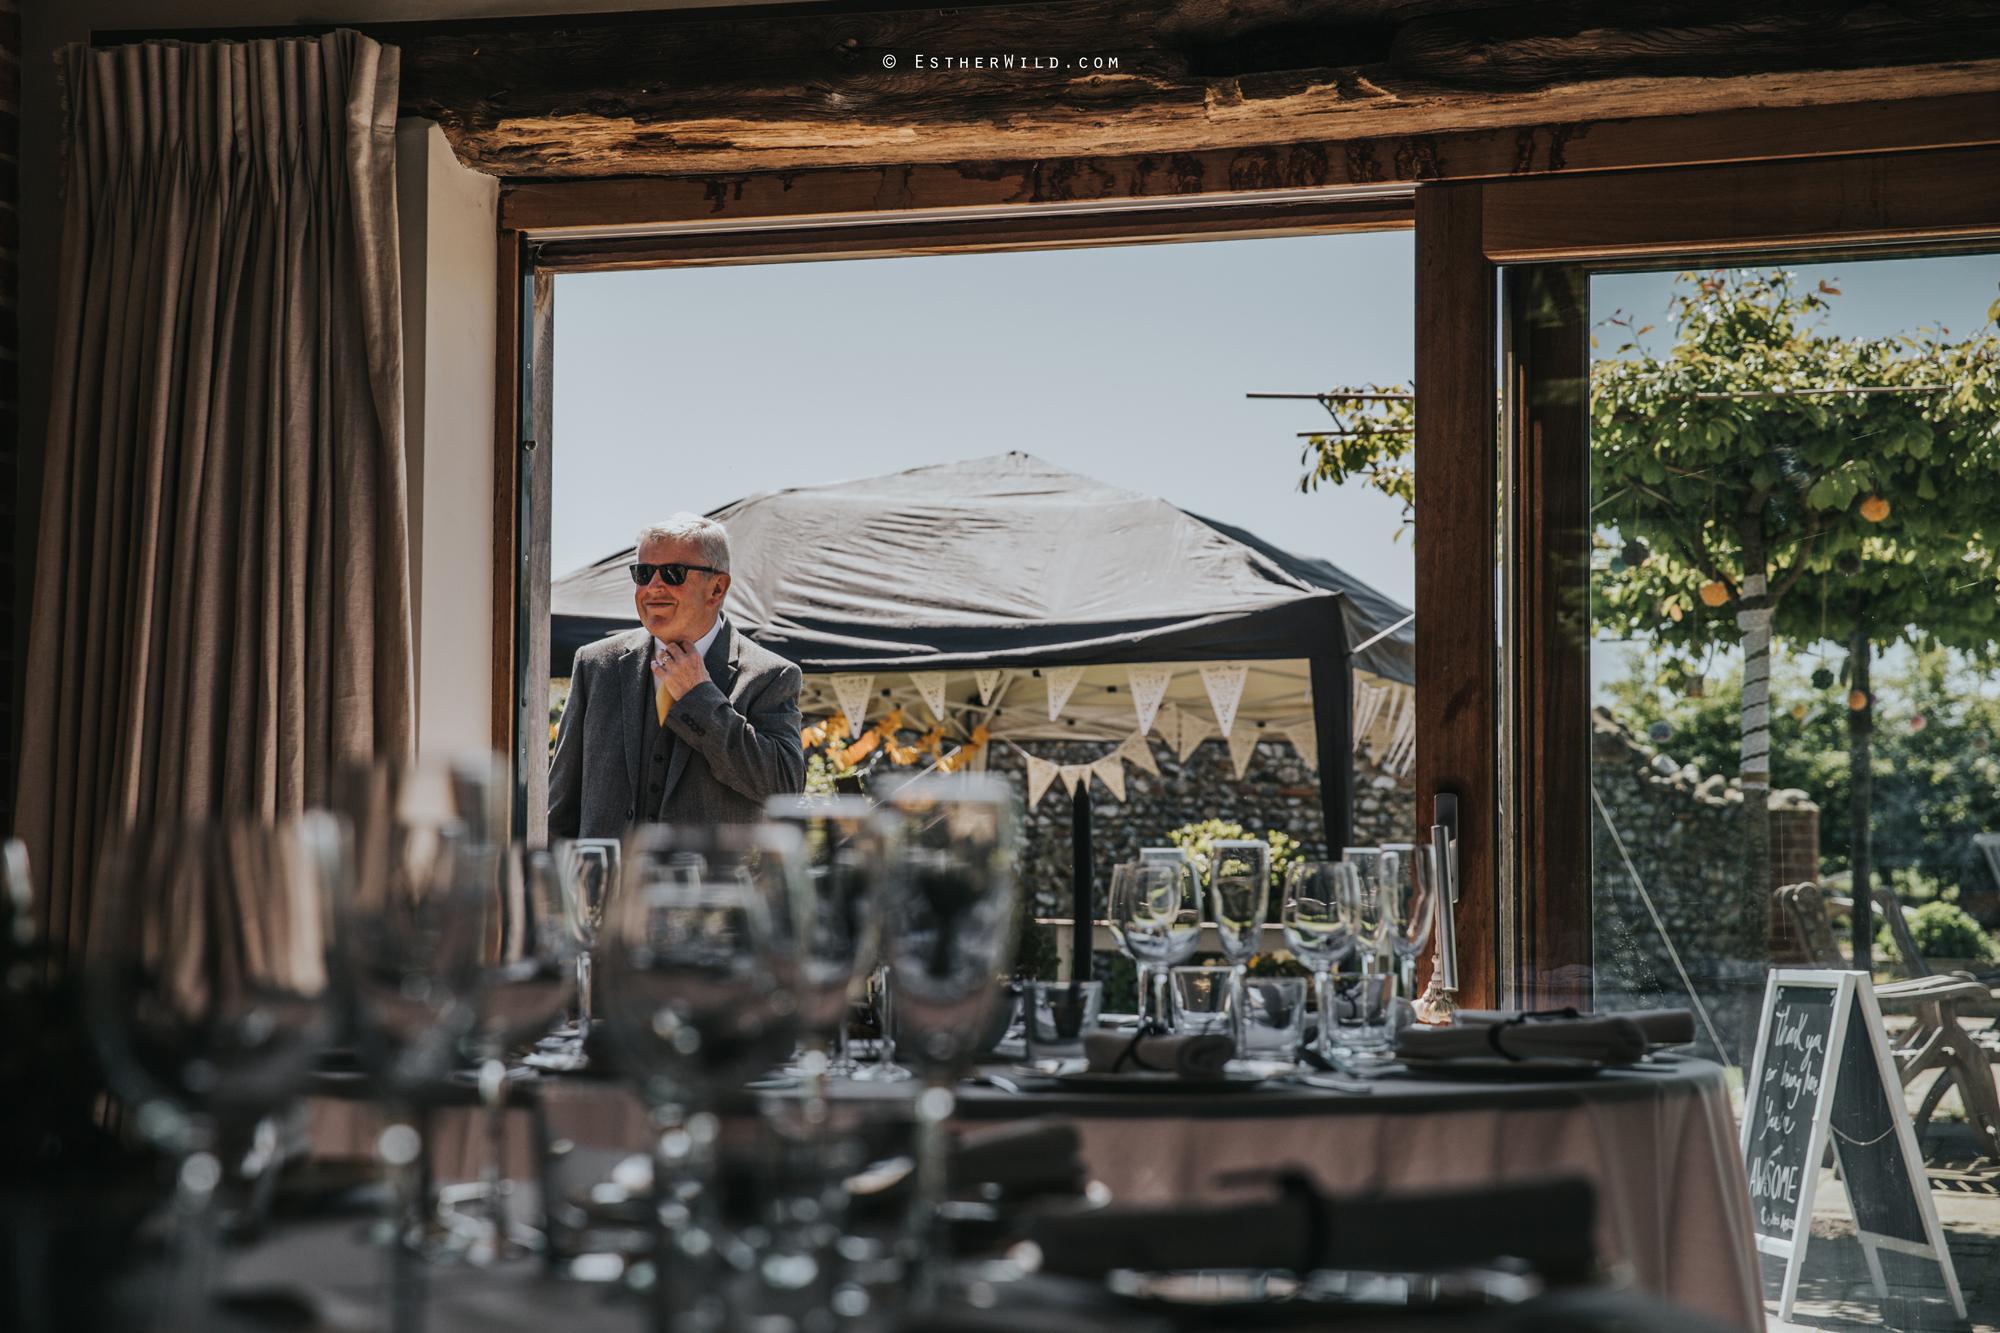 IMG_0045Cley_Barn_Drift_Norfolk_Coast_Wedding_Copyright_Esther_Wild_Photographer_.jpg